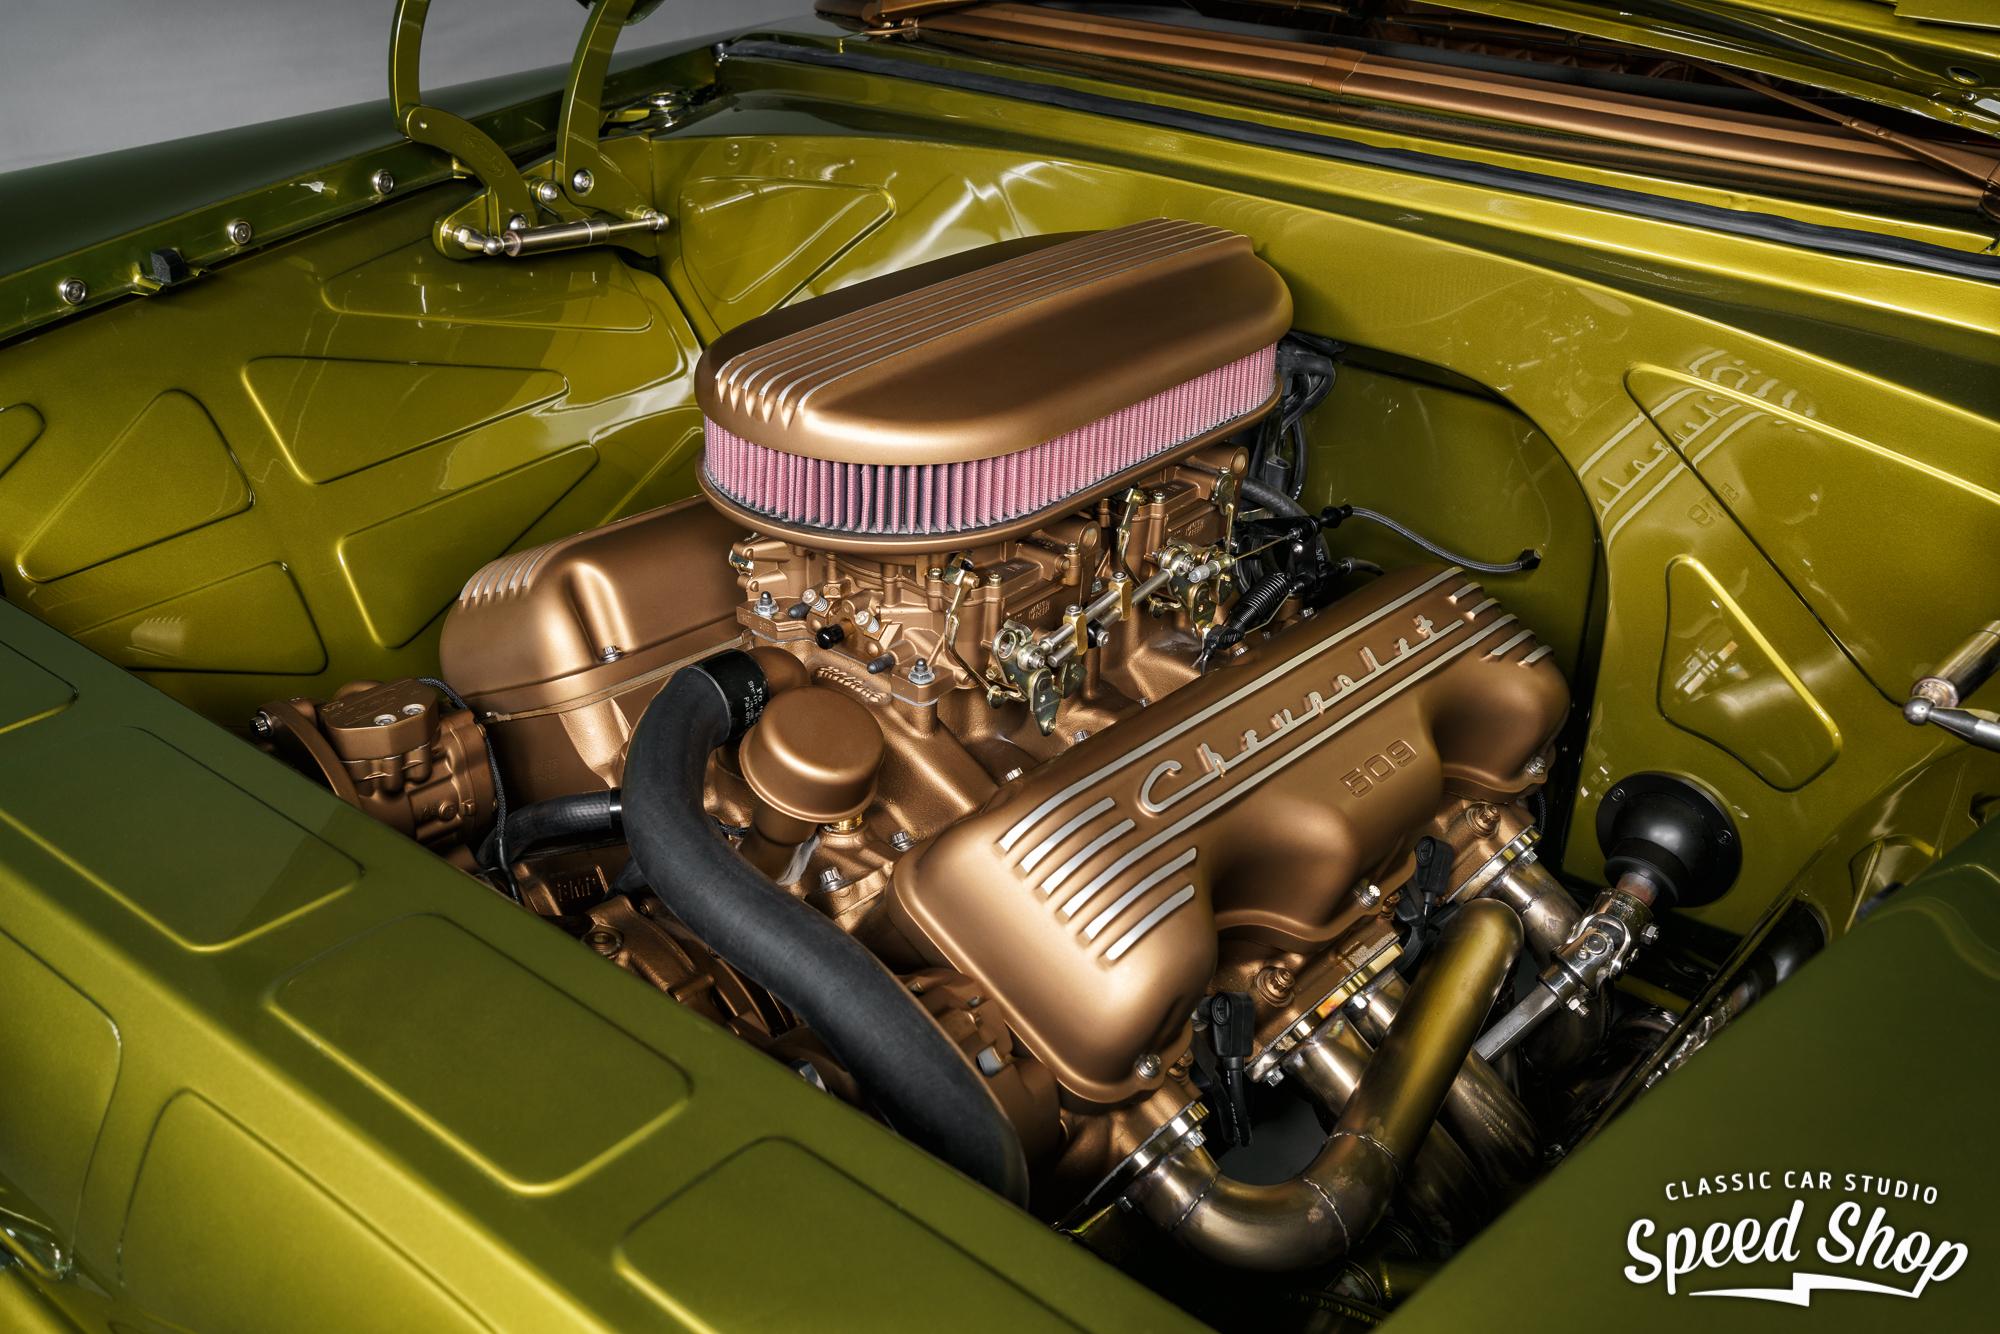 1955 Chevrolet Nomad engine